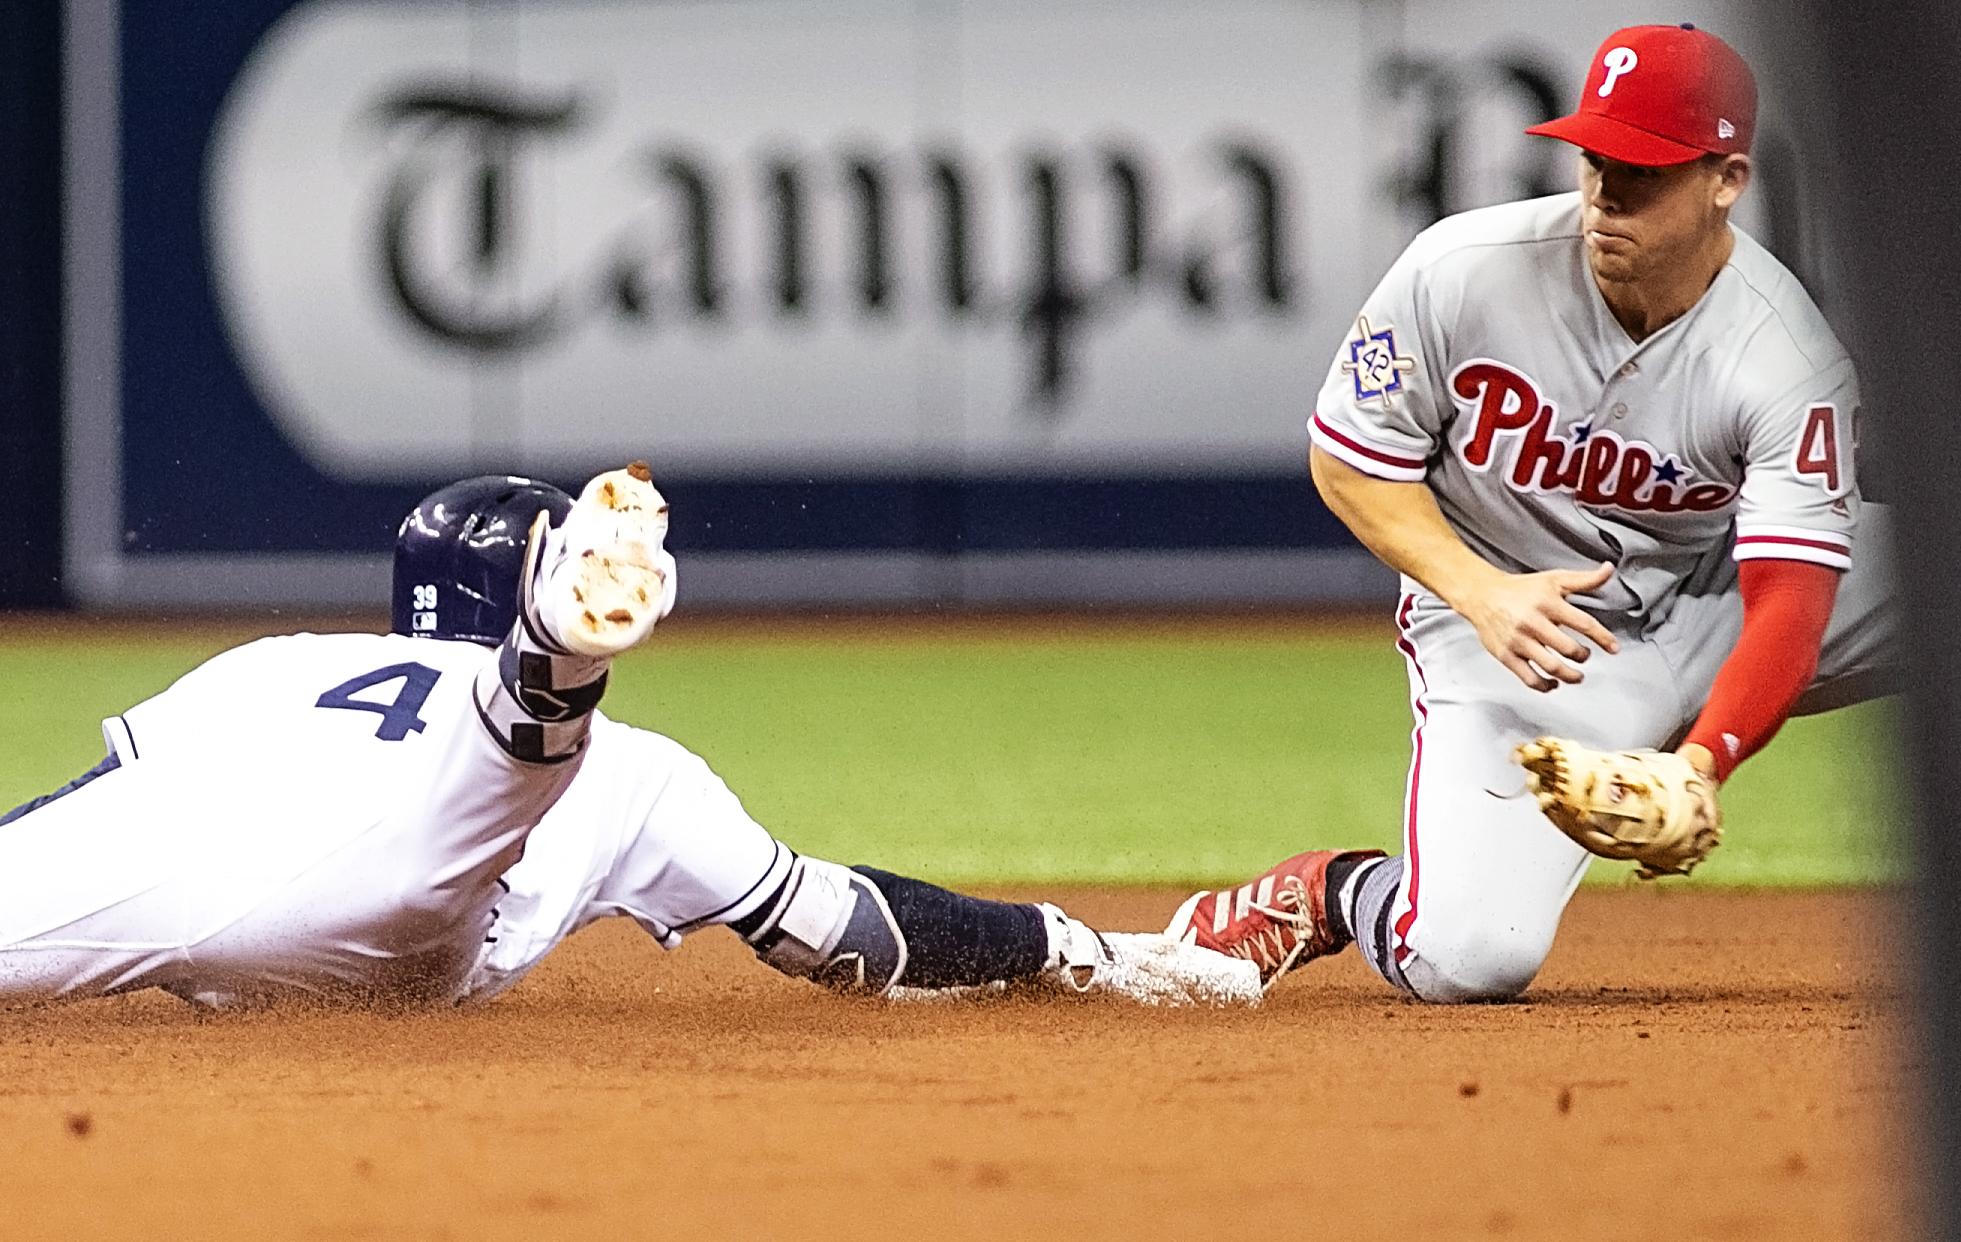 Rays' centerfielder Kevin Kiermaier takes an extra base on a bobble./CARMEN MANDATO